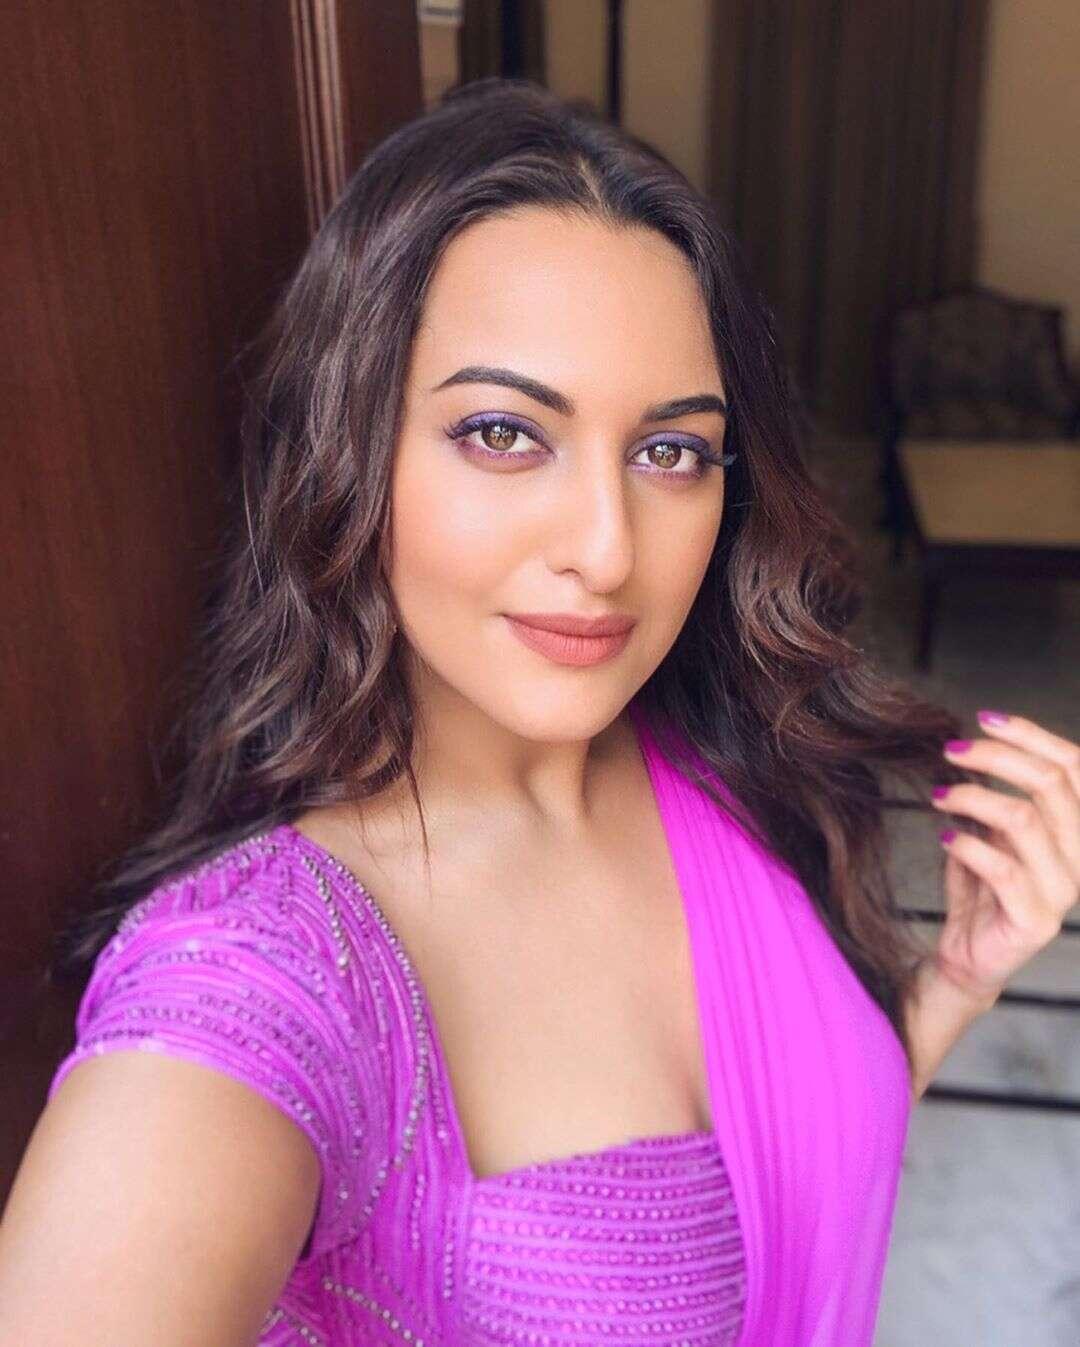 flaunt purple eyeliner like Sonakshi Sinha